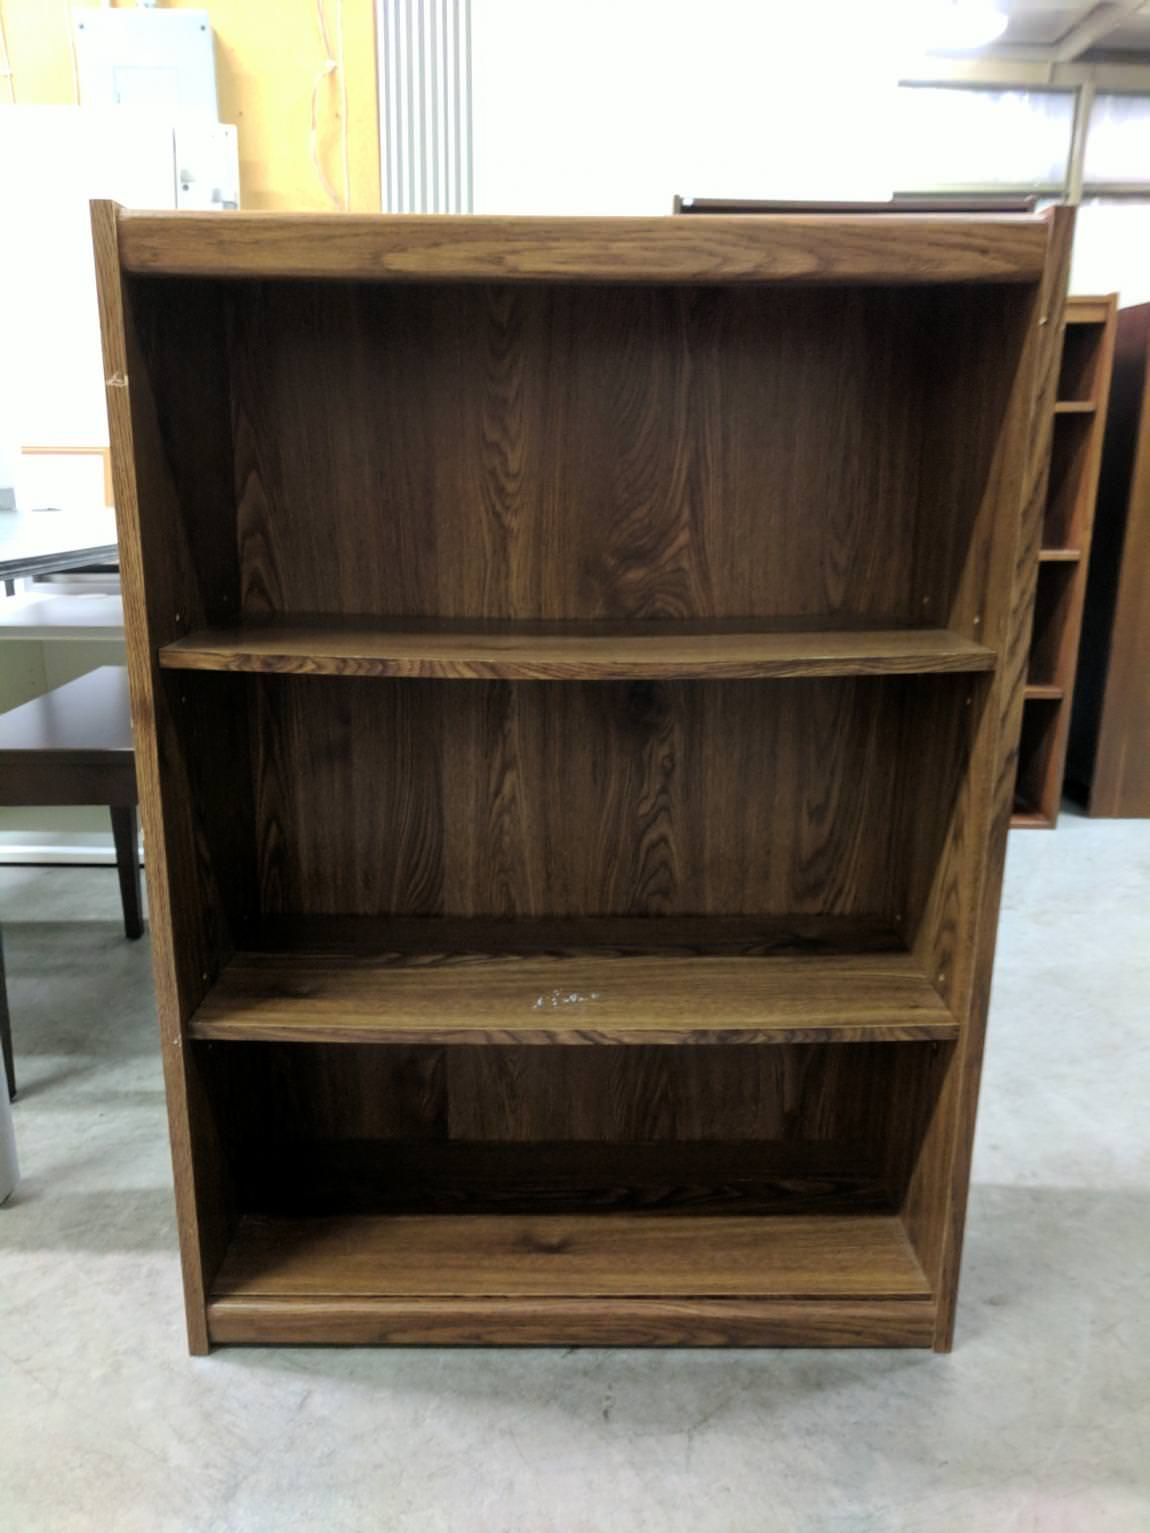 Bookshelf 30 Inches Wide